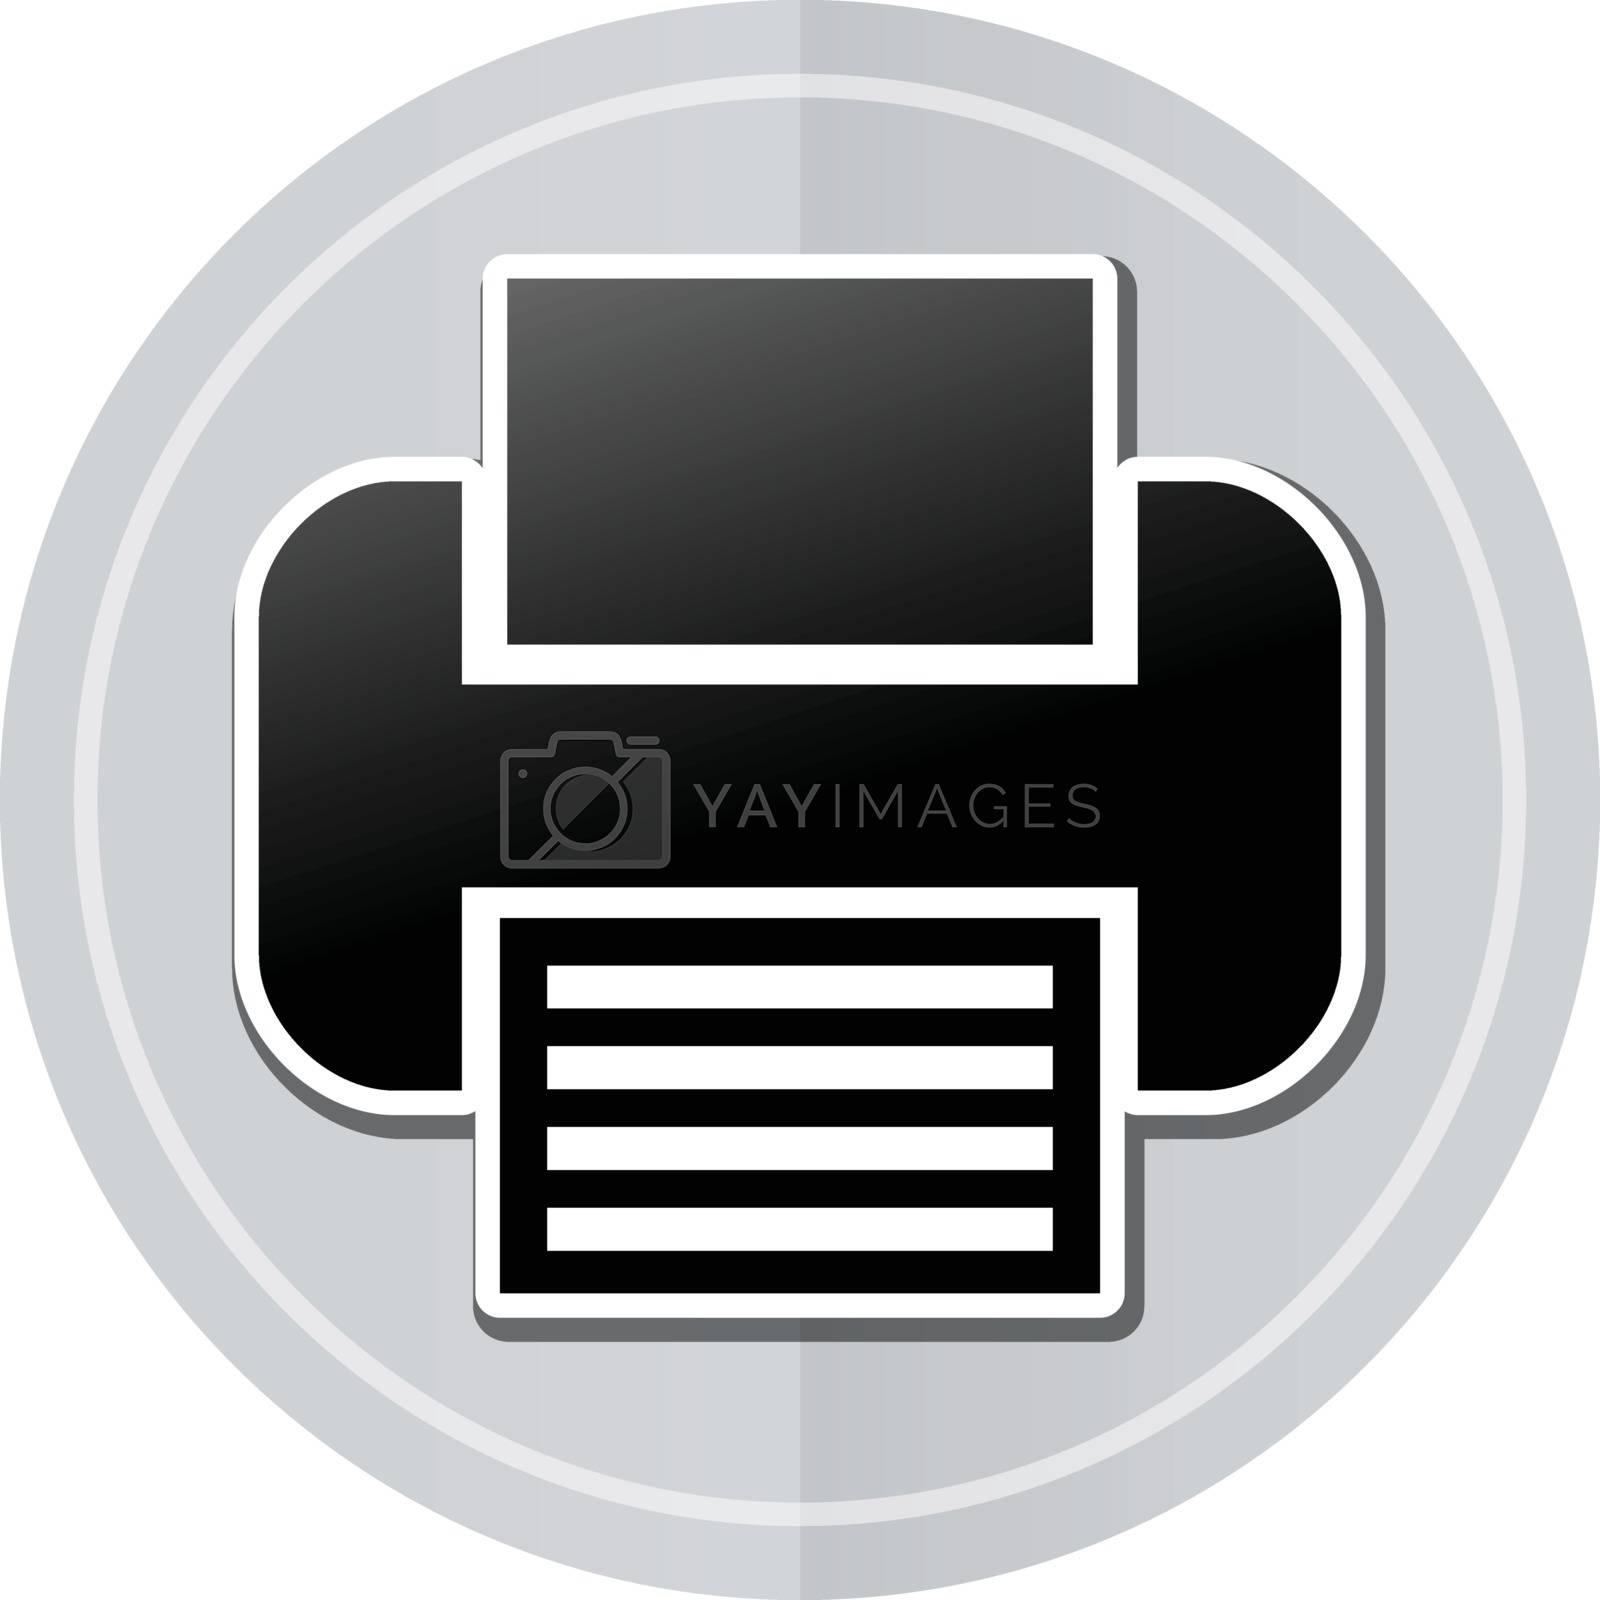 Illustration of printer sticker icon simple design